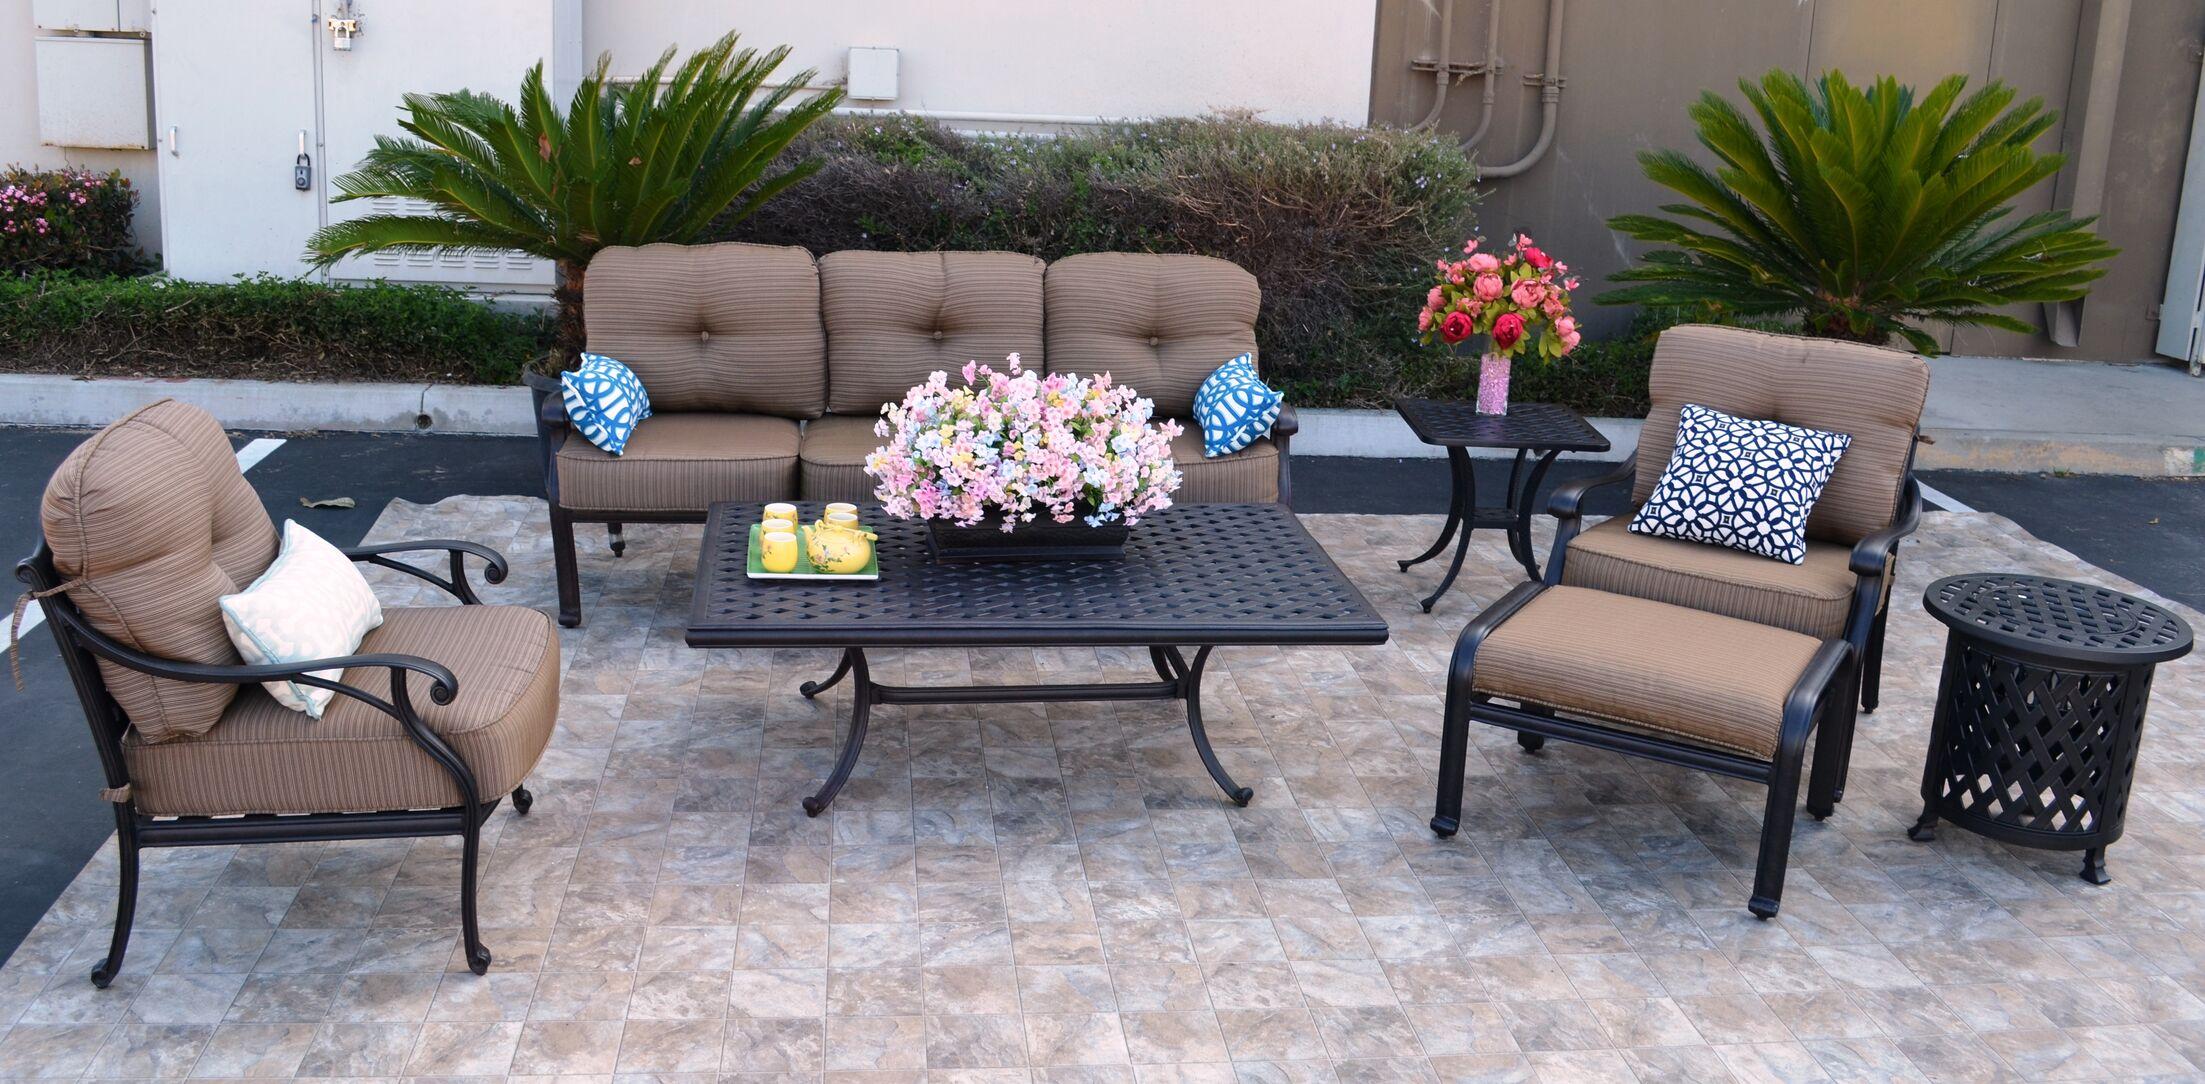 Nola 7 Piece Sofa Set with Cushions